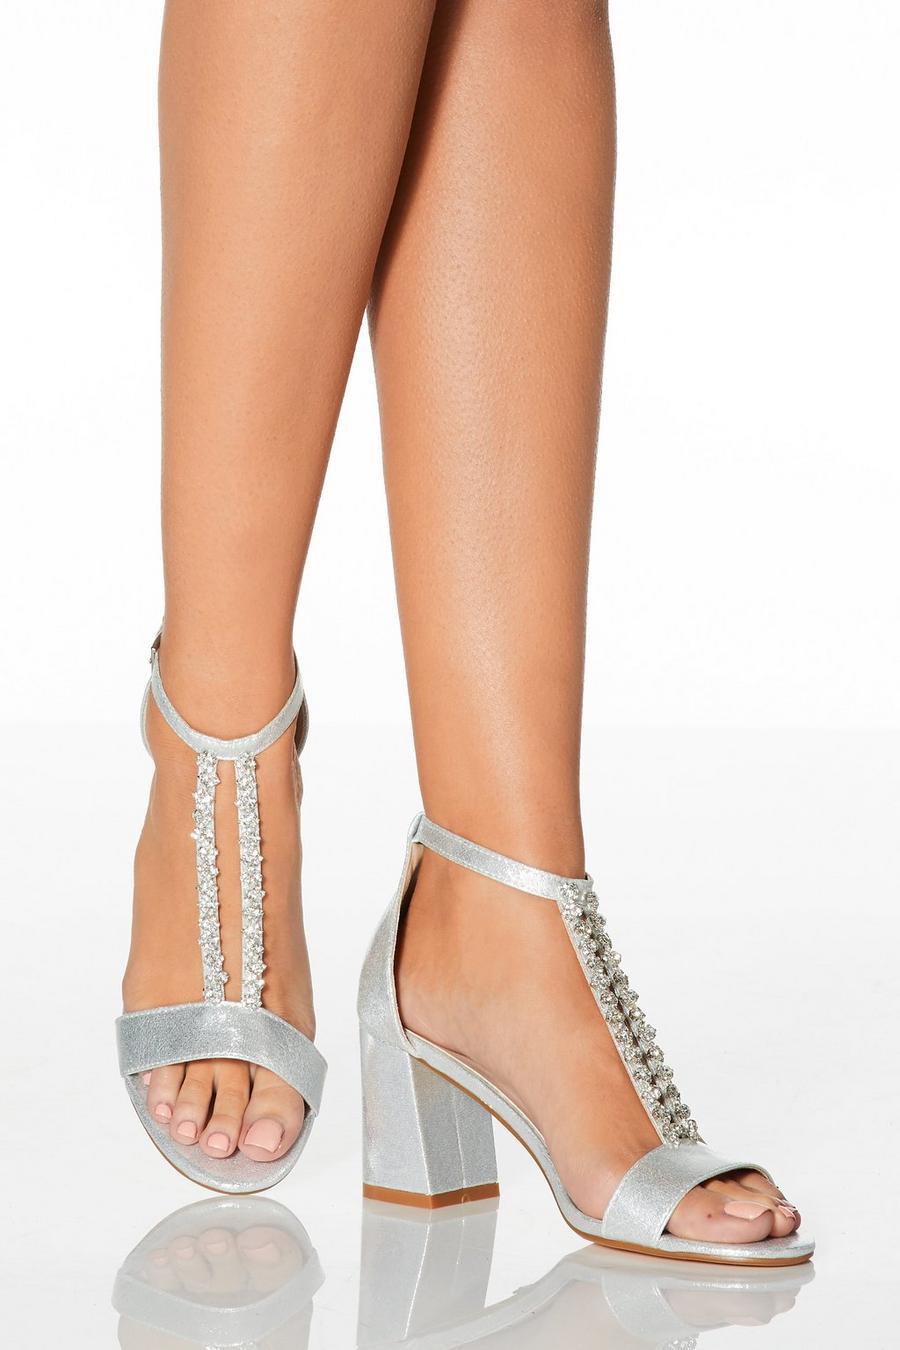 59777d2b818 Bridal Silver Diamante T-Bar Heeled Sandals - Quiz Clothing